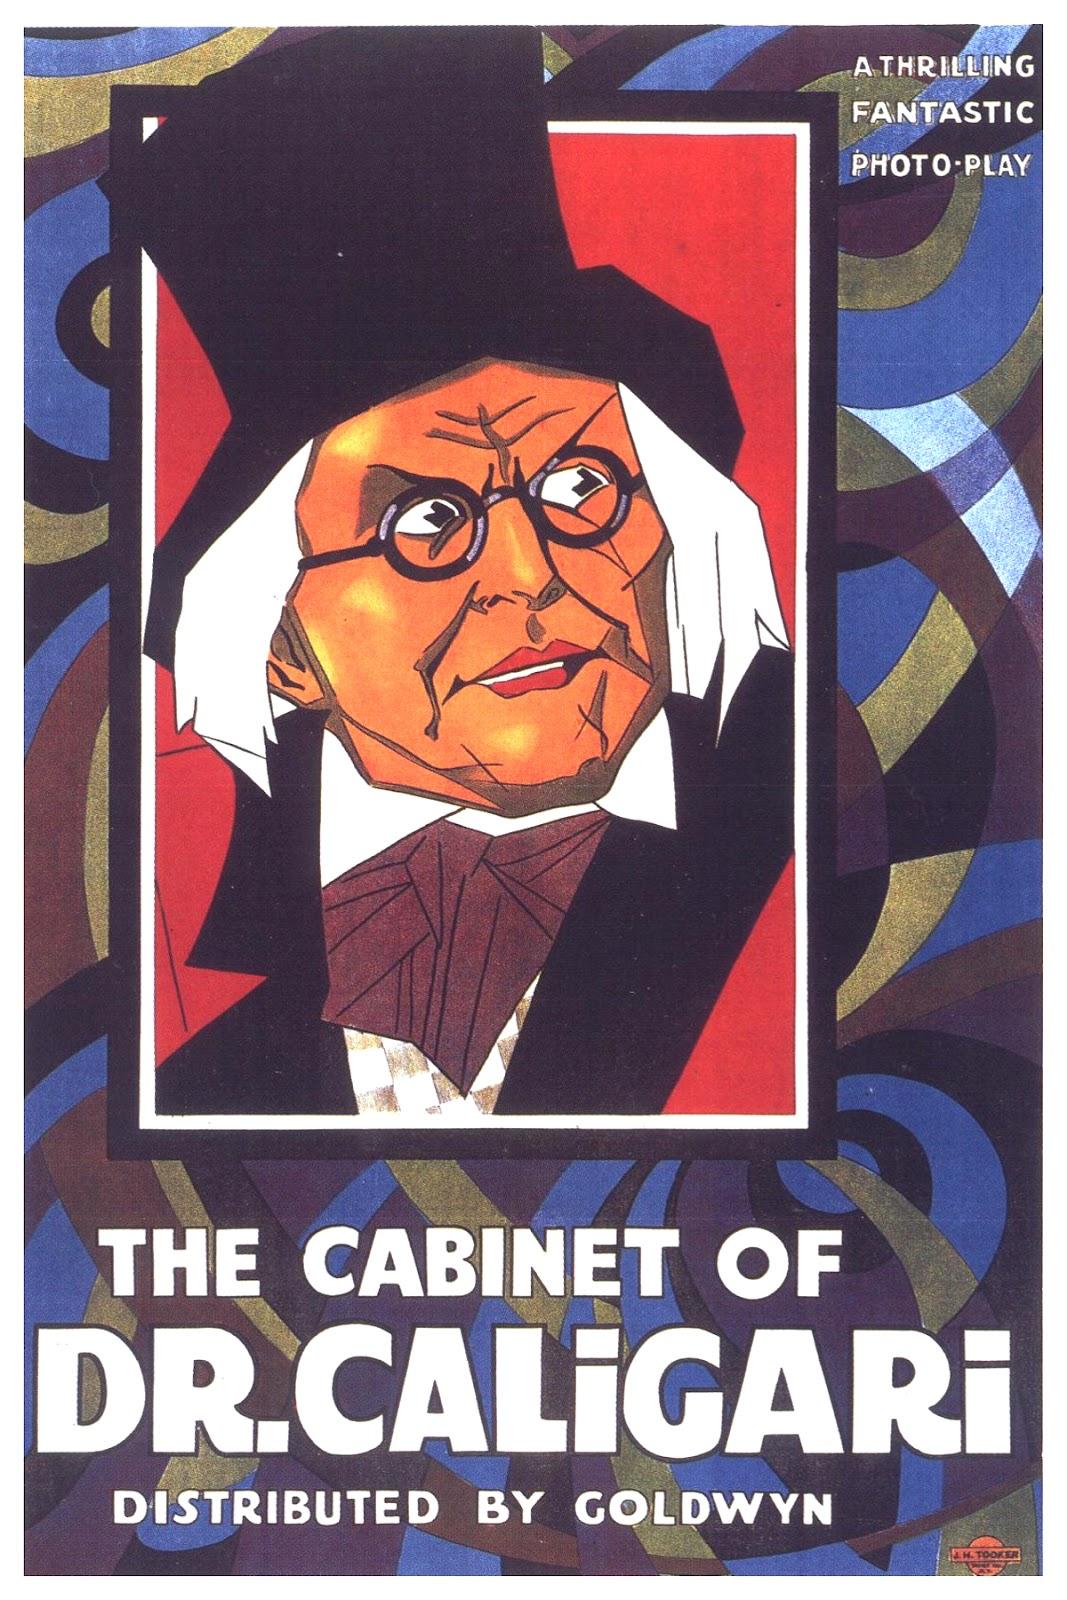 MOVIE POSTERS: DAS CABINET DES DR. CALIGARI (1920)